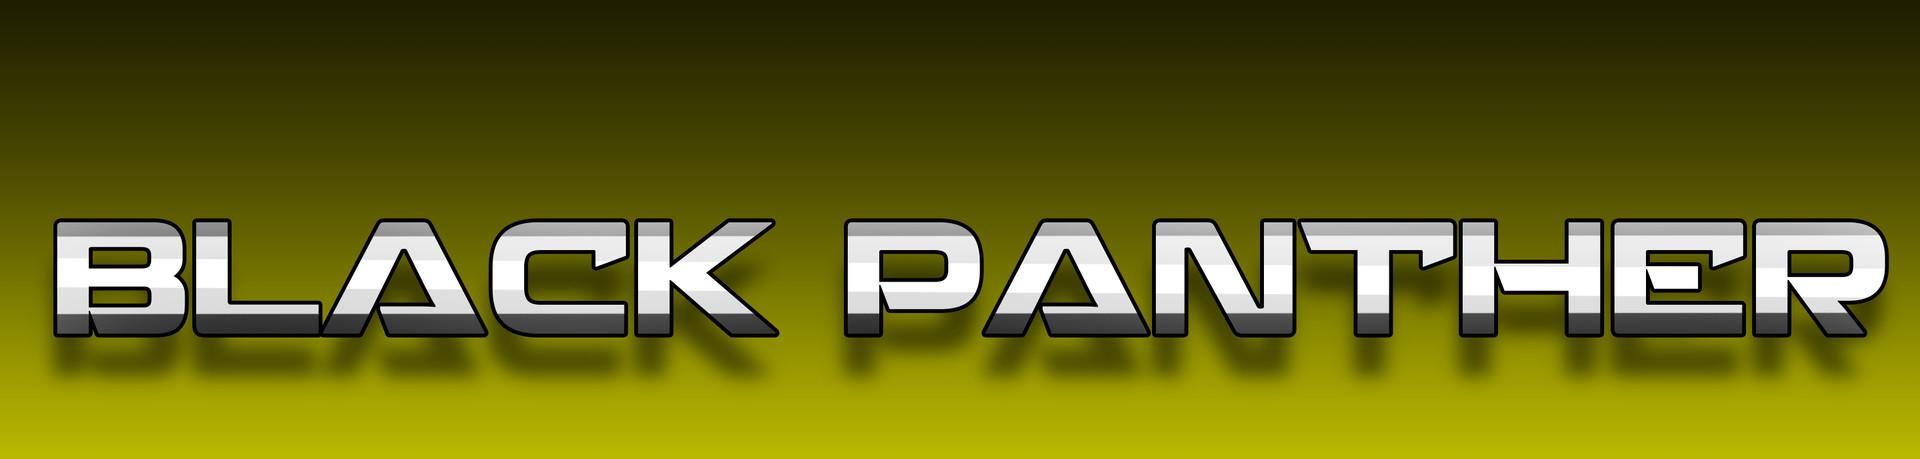 Robert e wilson black panther 5